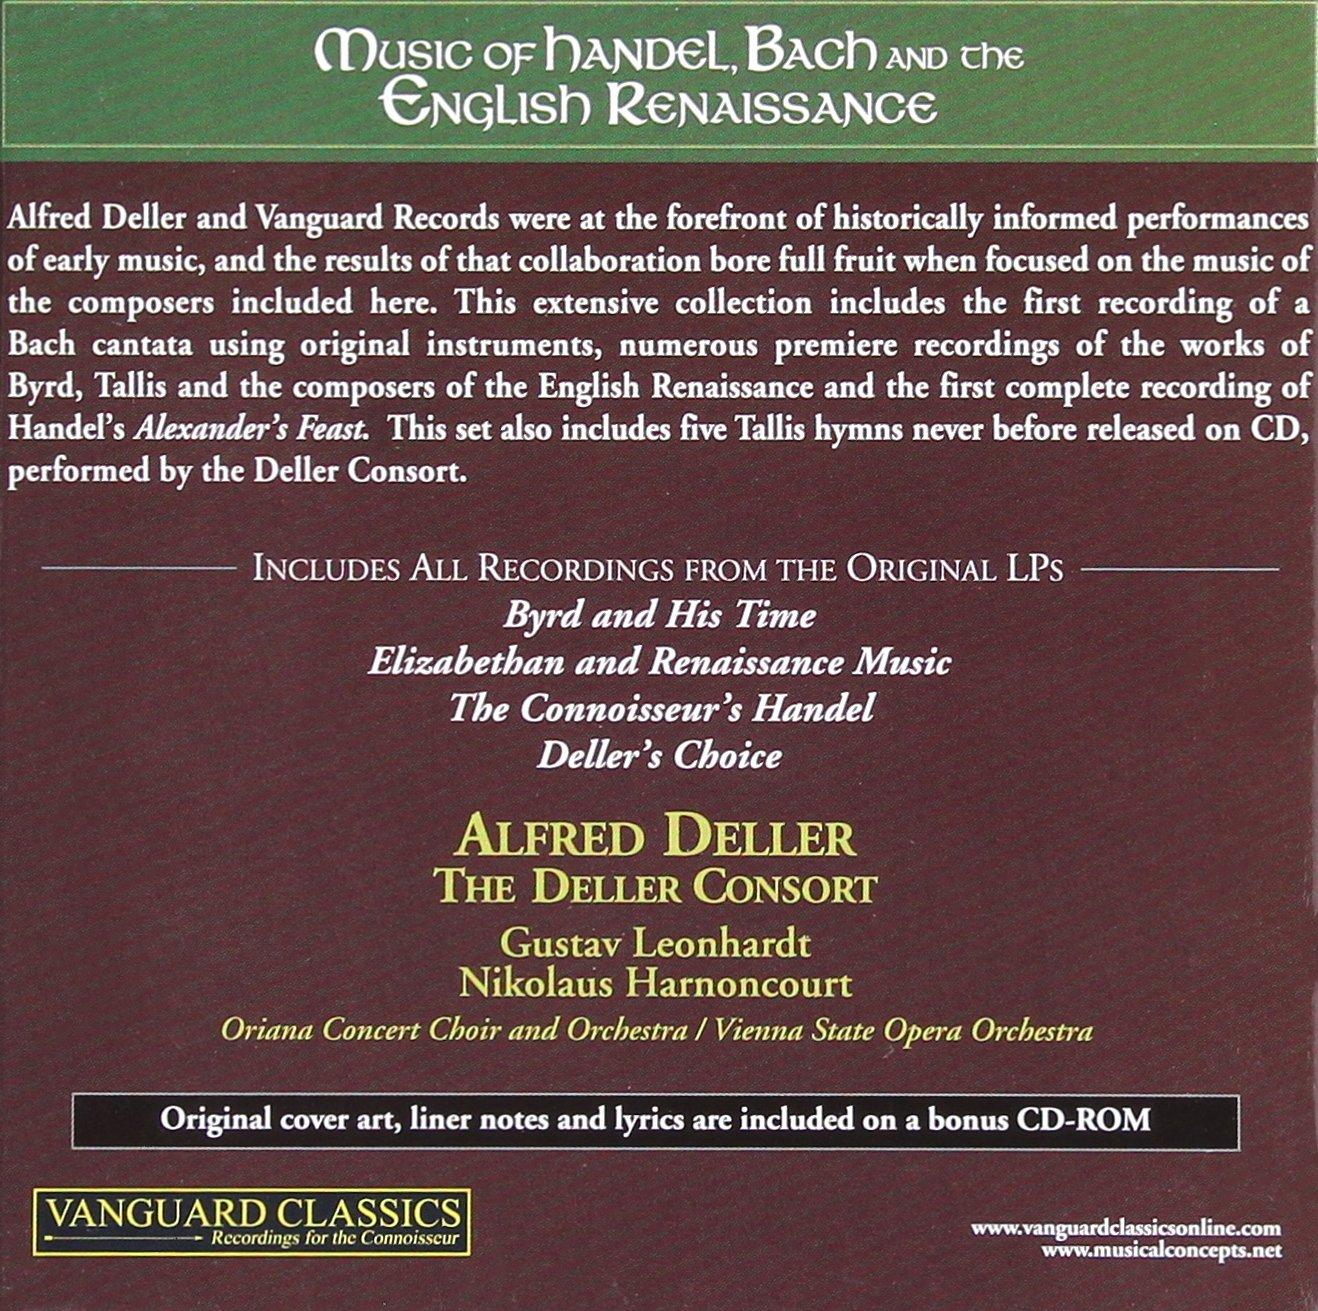 Music of Handel Bach & the English Renaissance 4